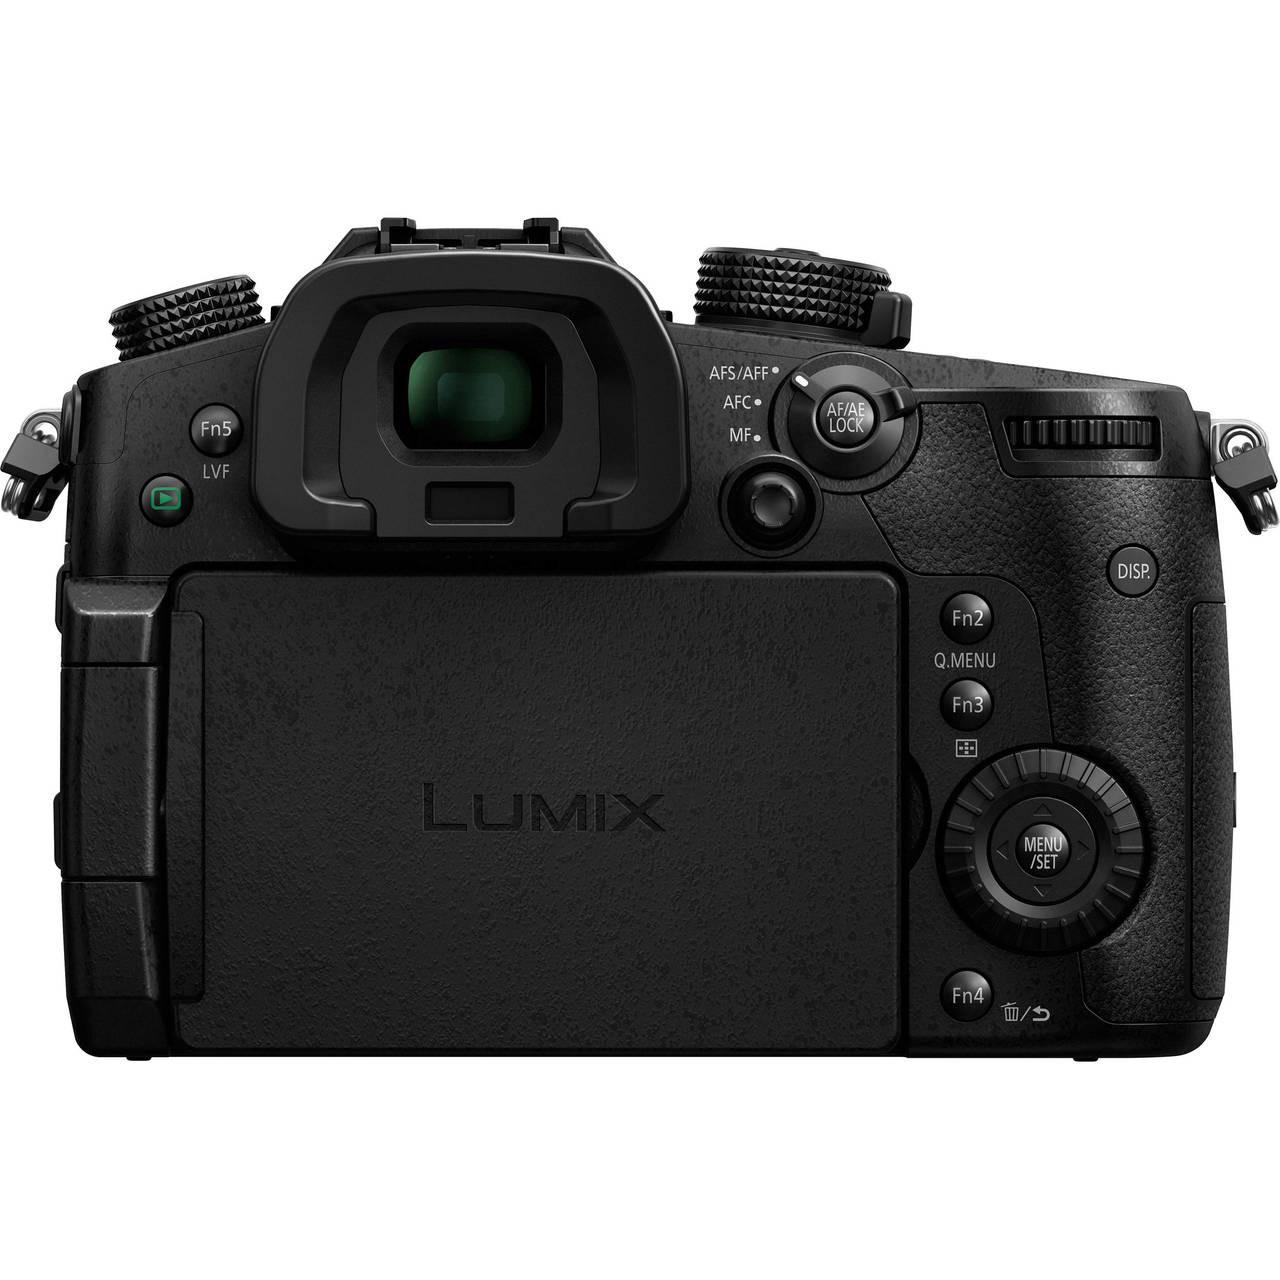 Lumix DMC-GH5 Body - Back (Screen Closed)